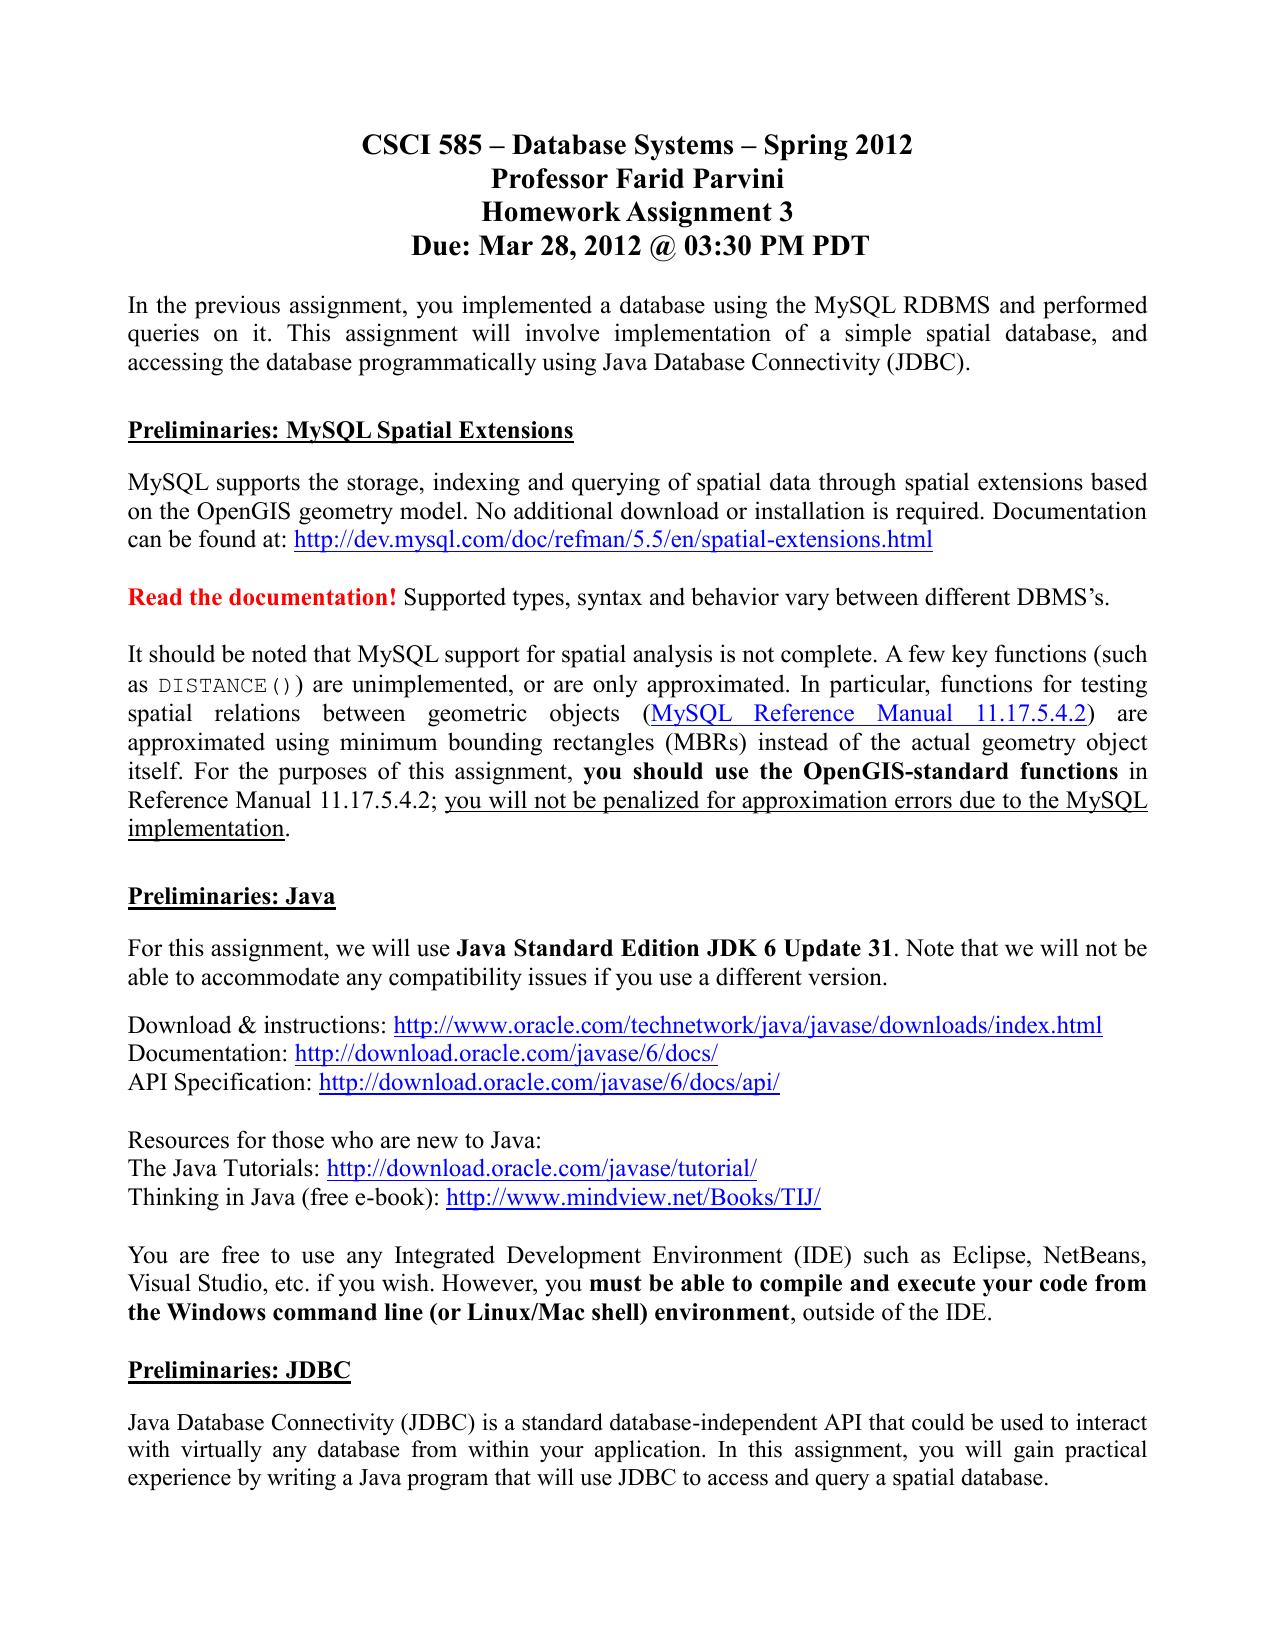 CSCI 585 – Database Systems – Spring 2012 Professor Farid | manualzz com